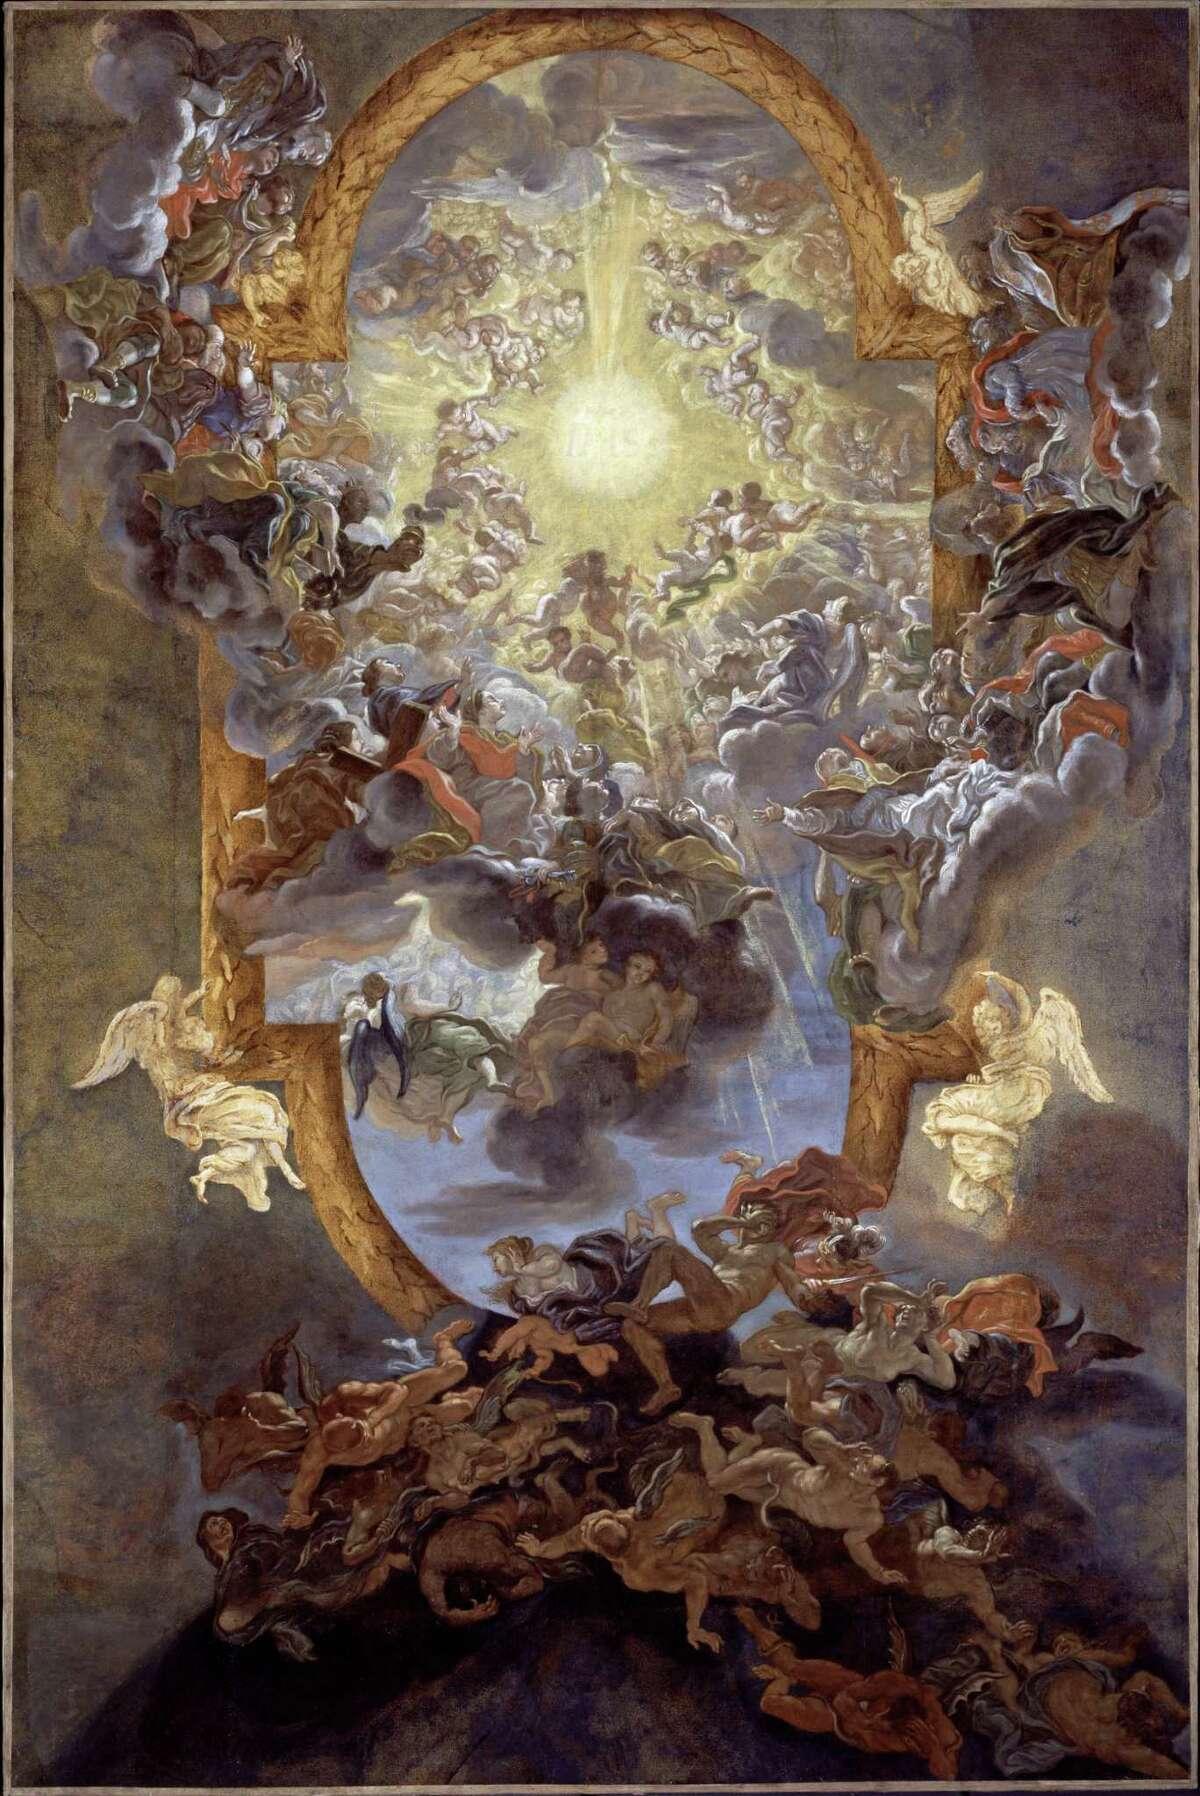 An oil study of the fresco